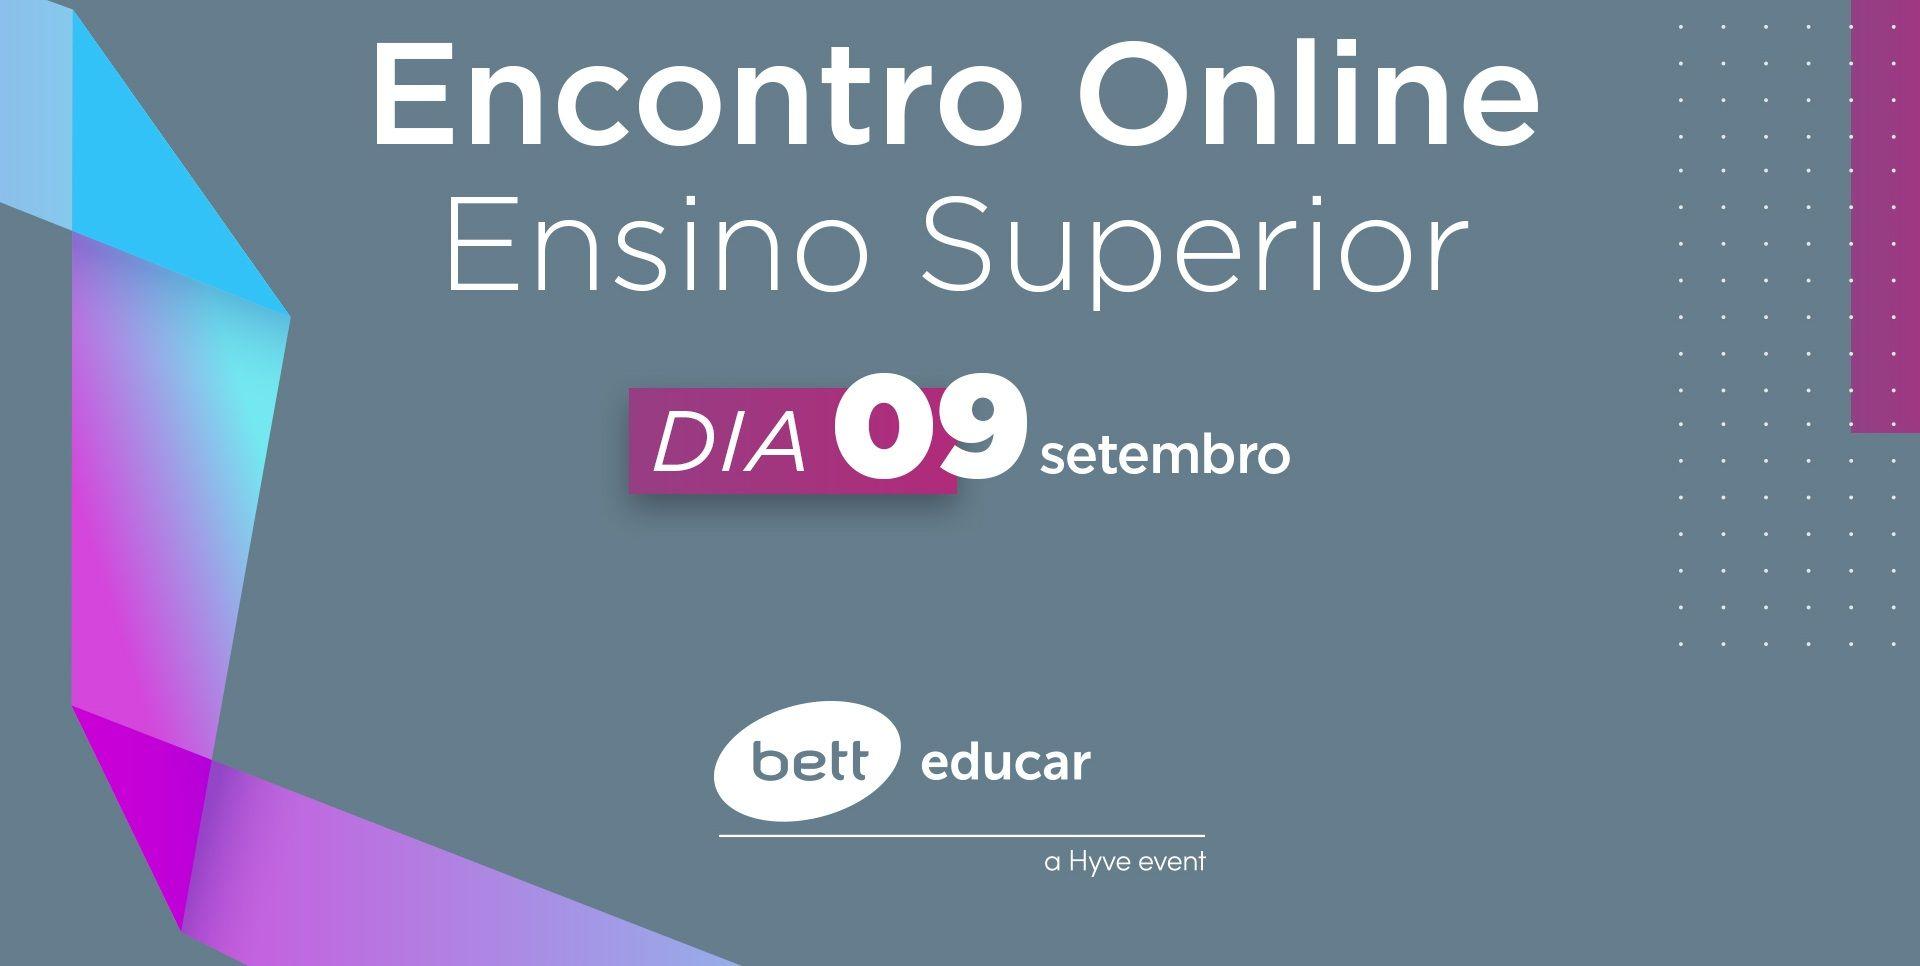 Encontro Online - Ensino Superior